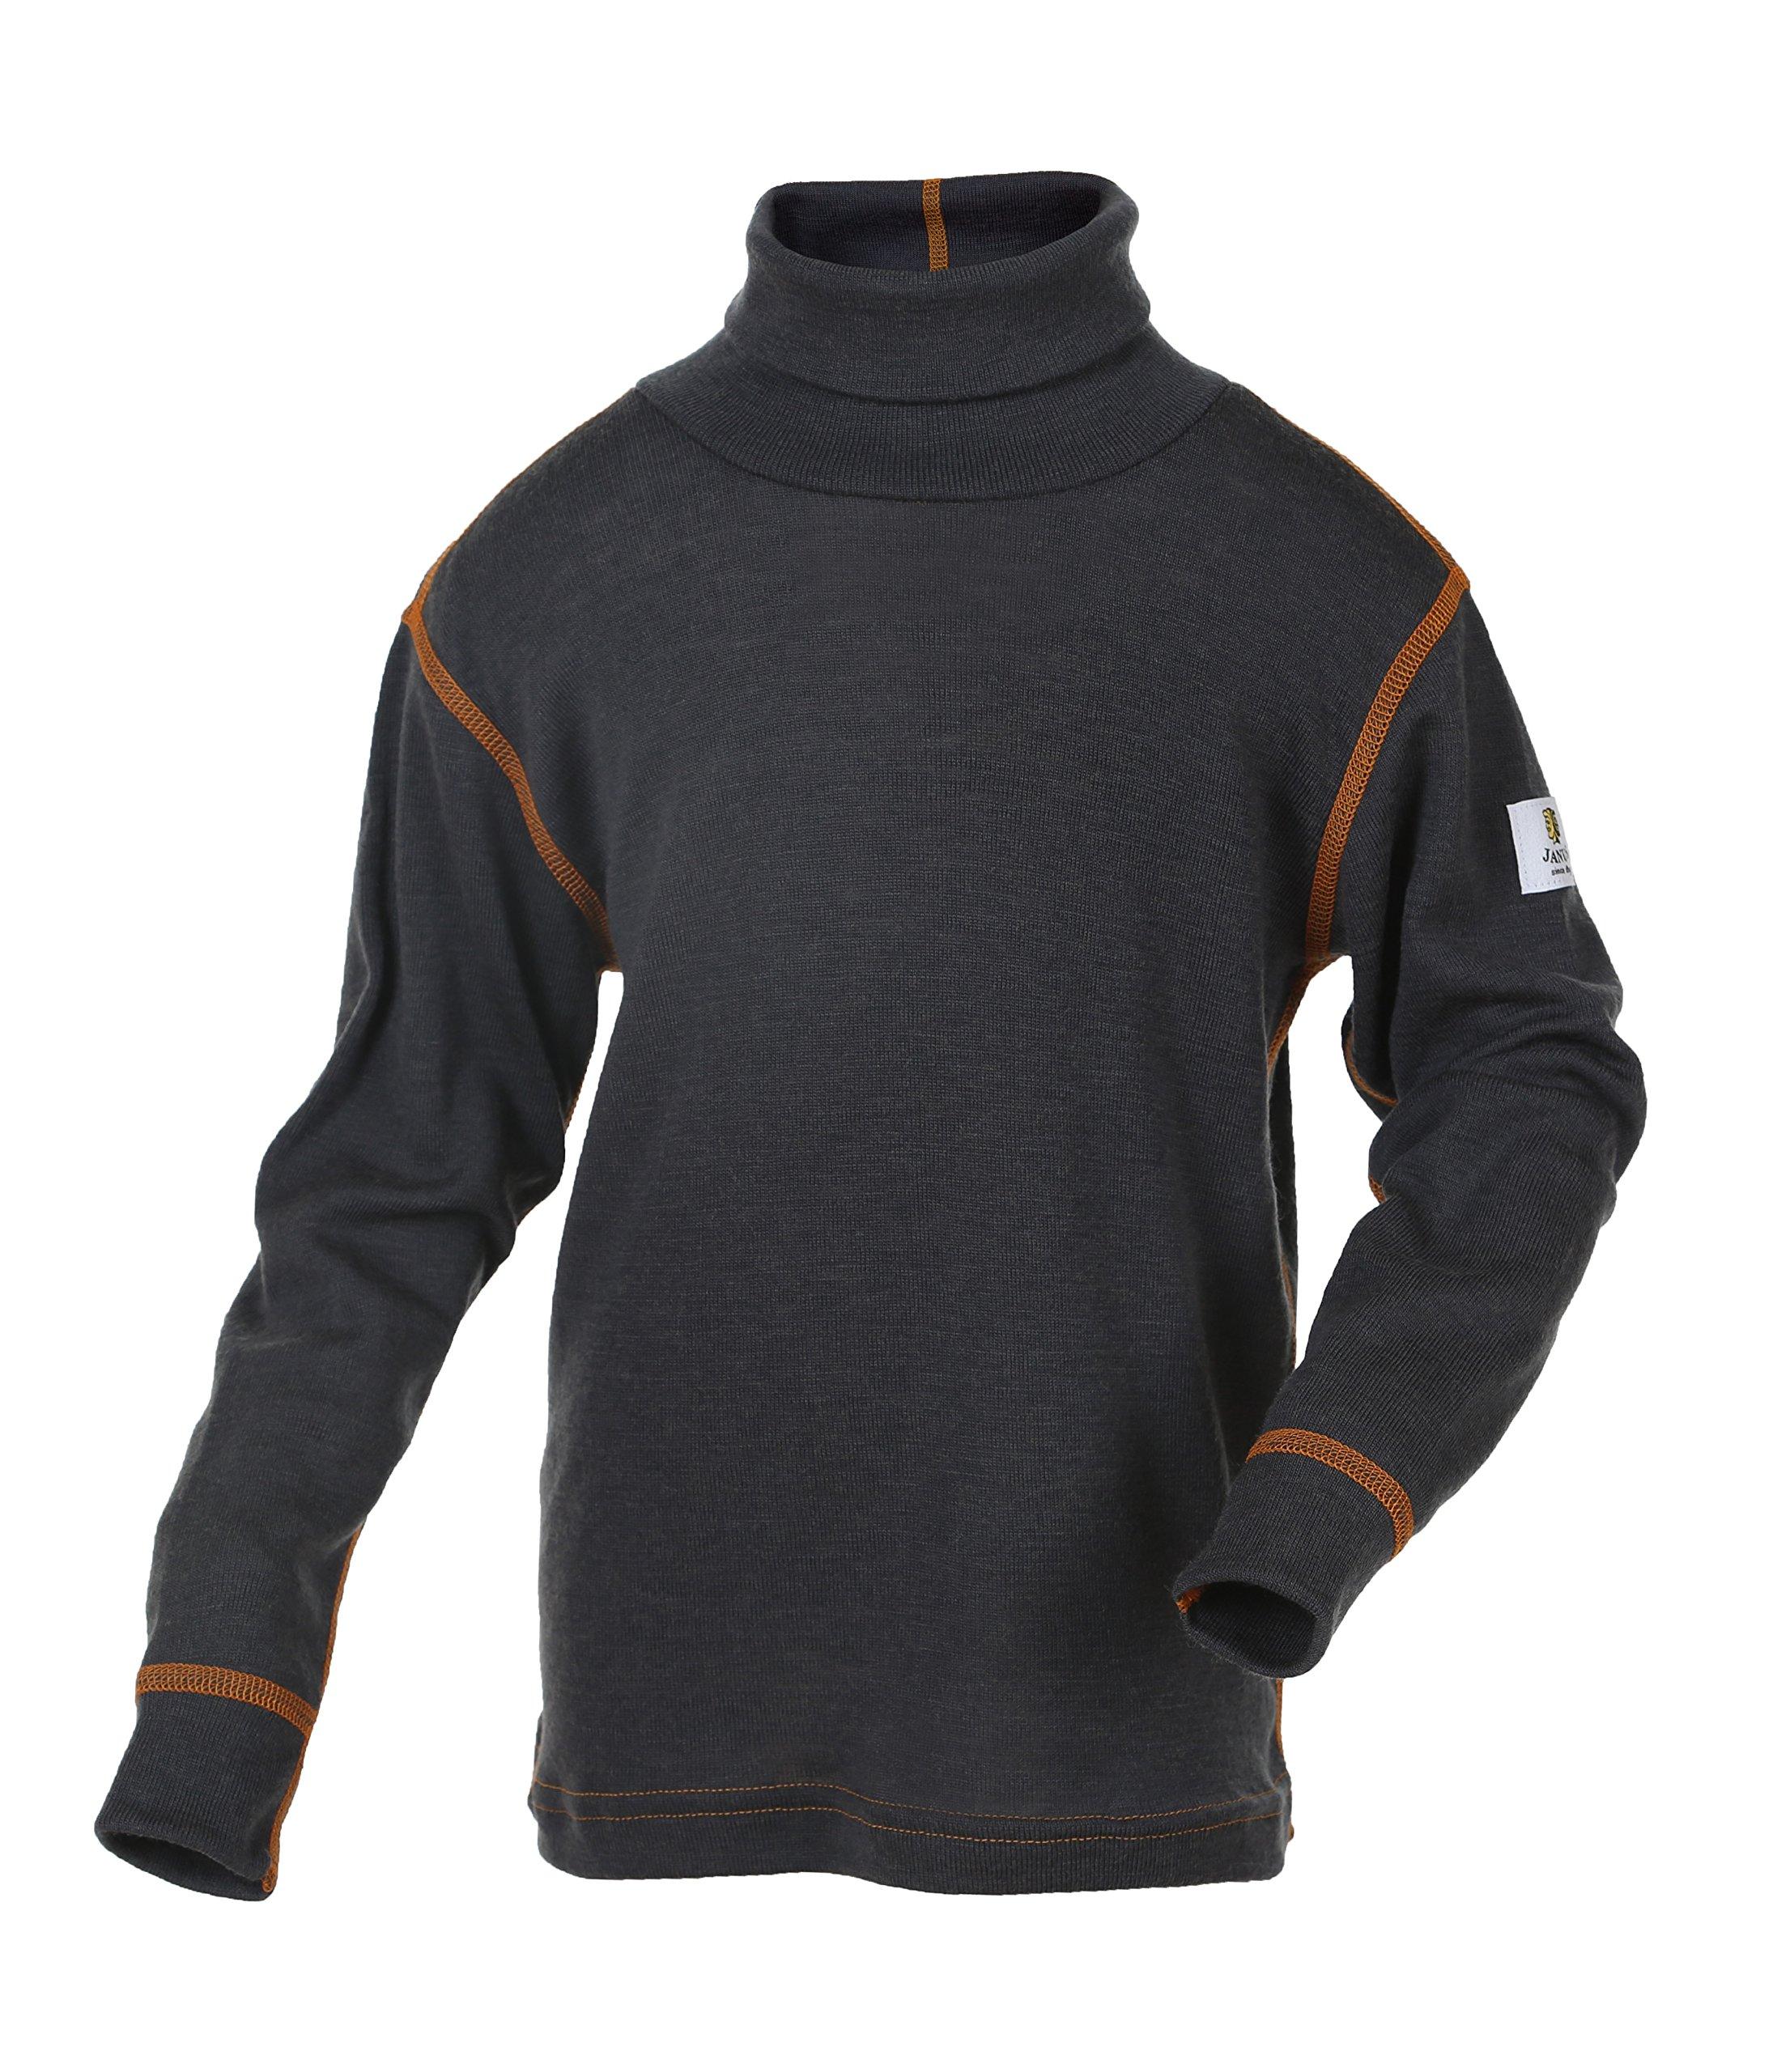 Janus 100% Merino Wool Baby Kids Long Sleeve High Collar T-shirt Made in Norway (140, Grey) by Janus